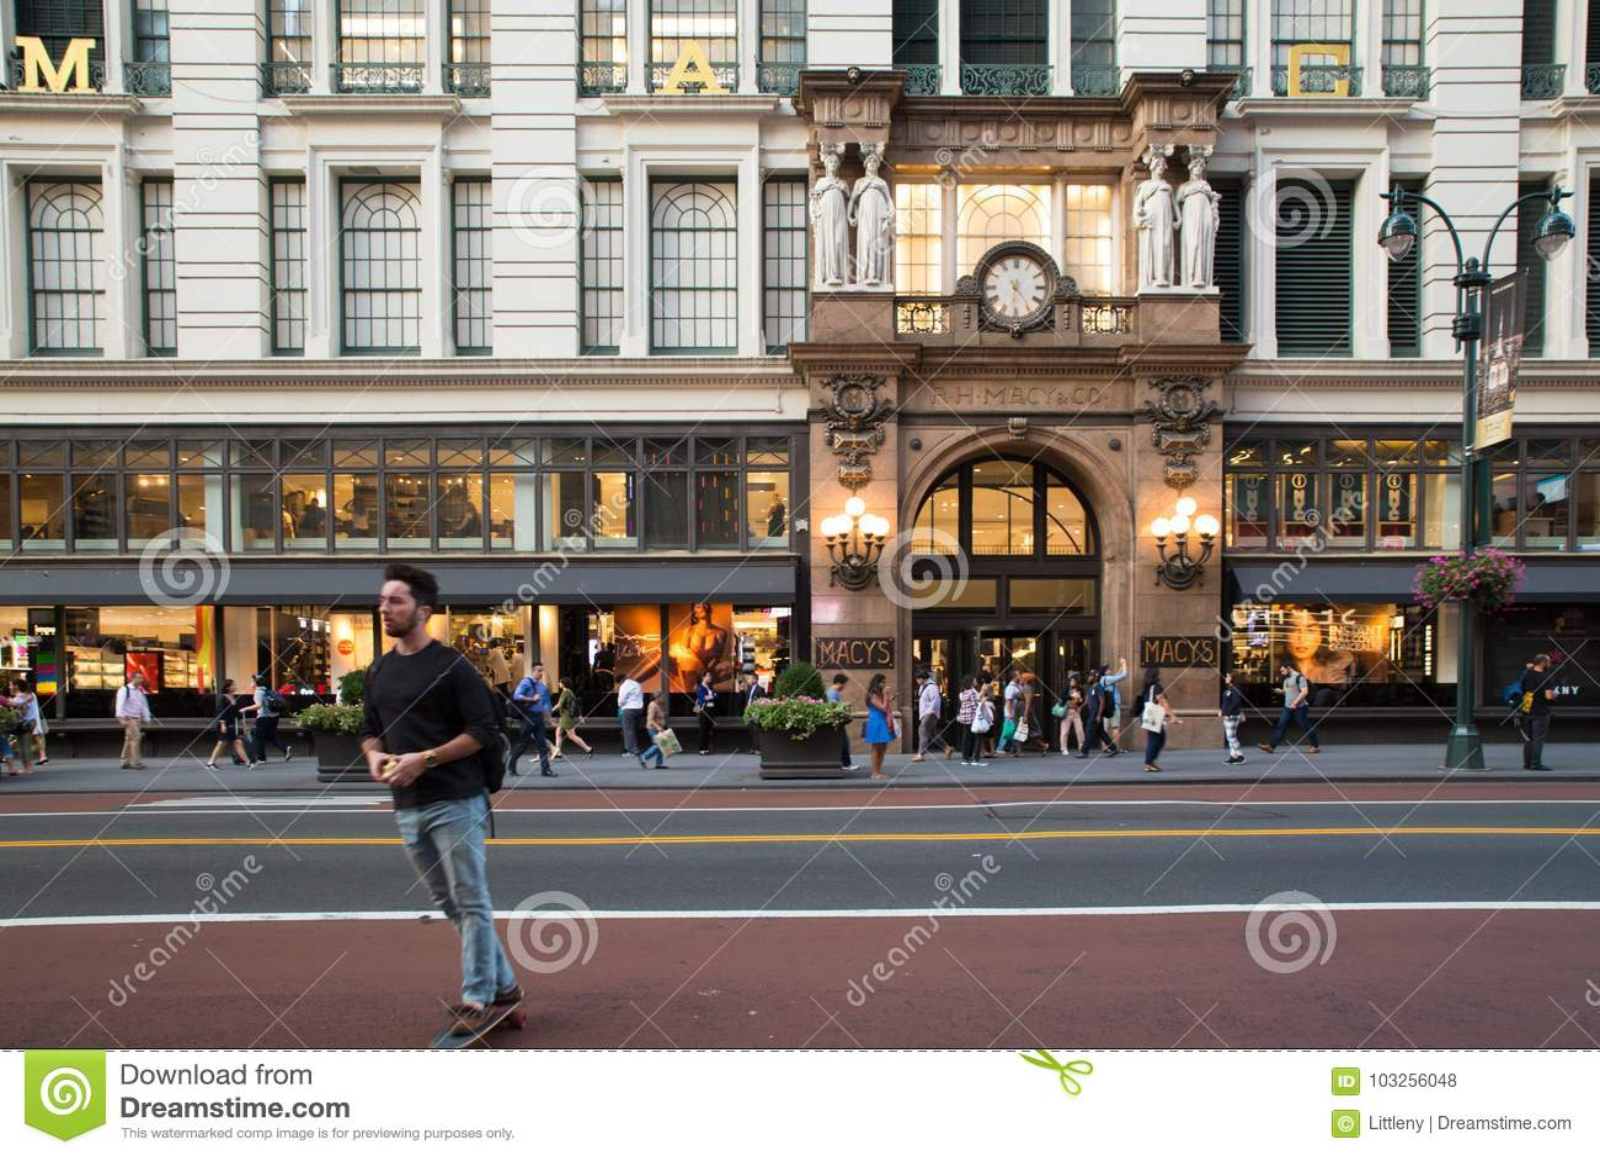 d104bda9191e Macy`s Herald Square NYC editorial stock photo. Image of parade ...